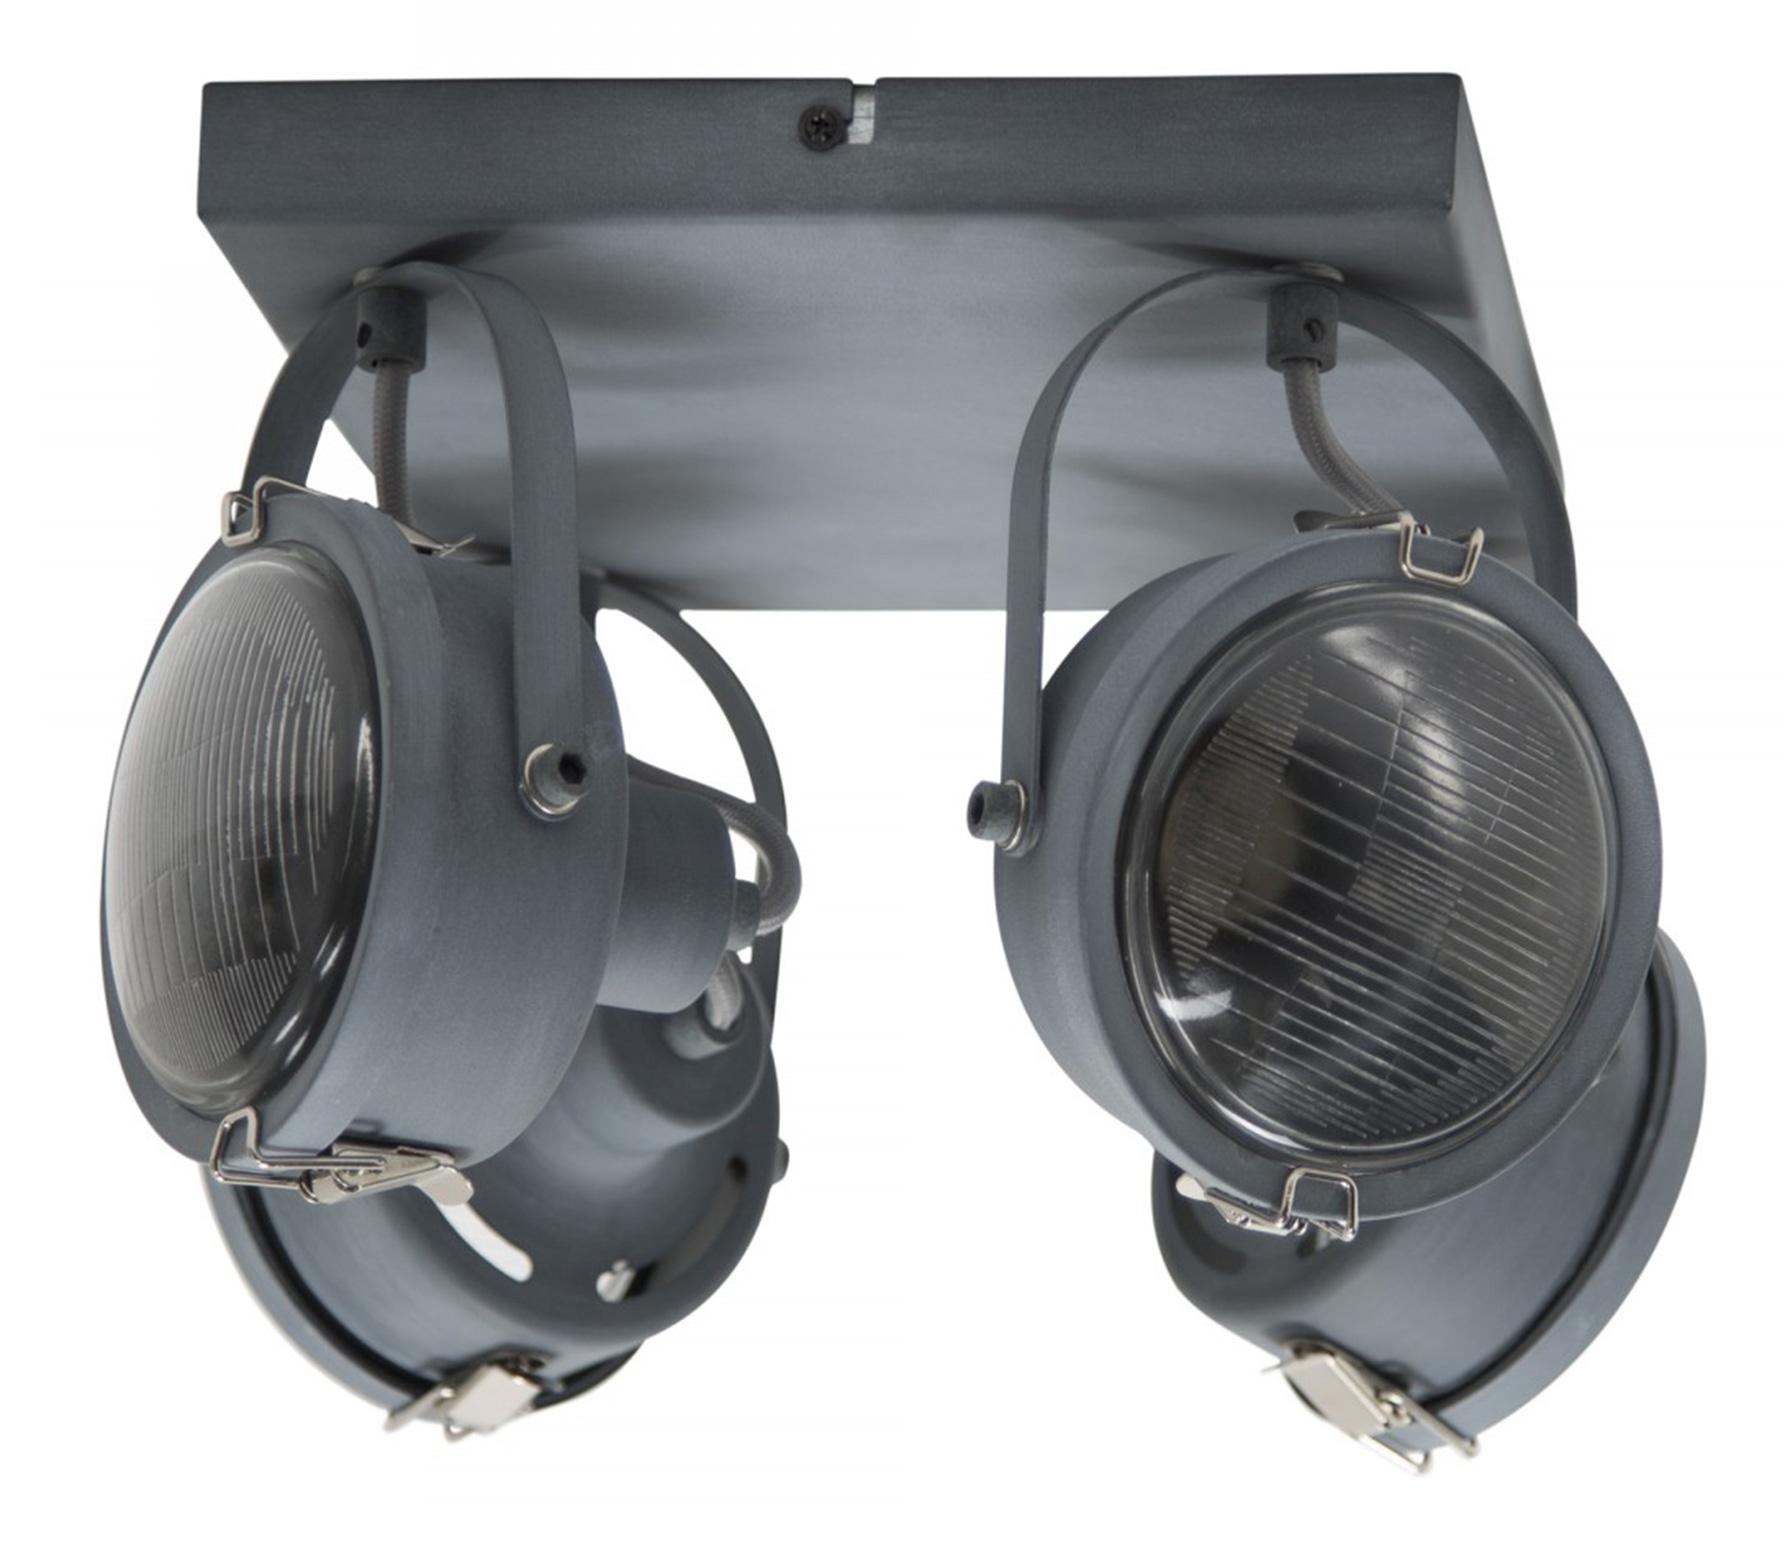 Satellite 4 plafondlamp/wandlamp metaal grijs